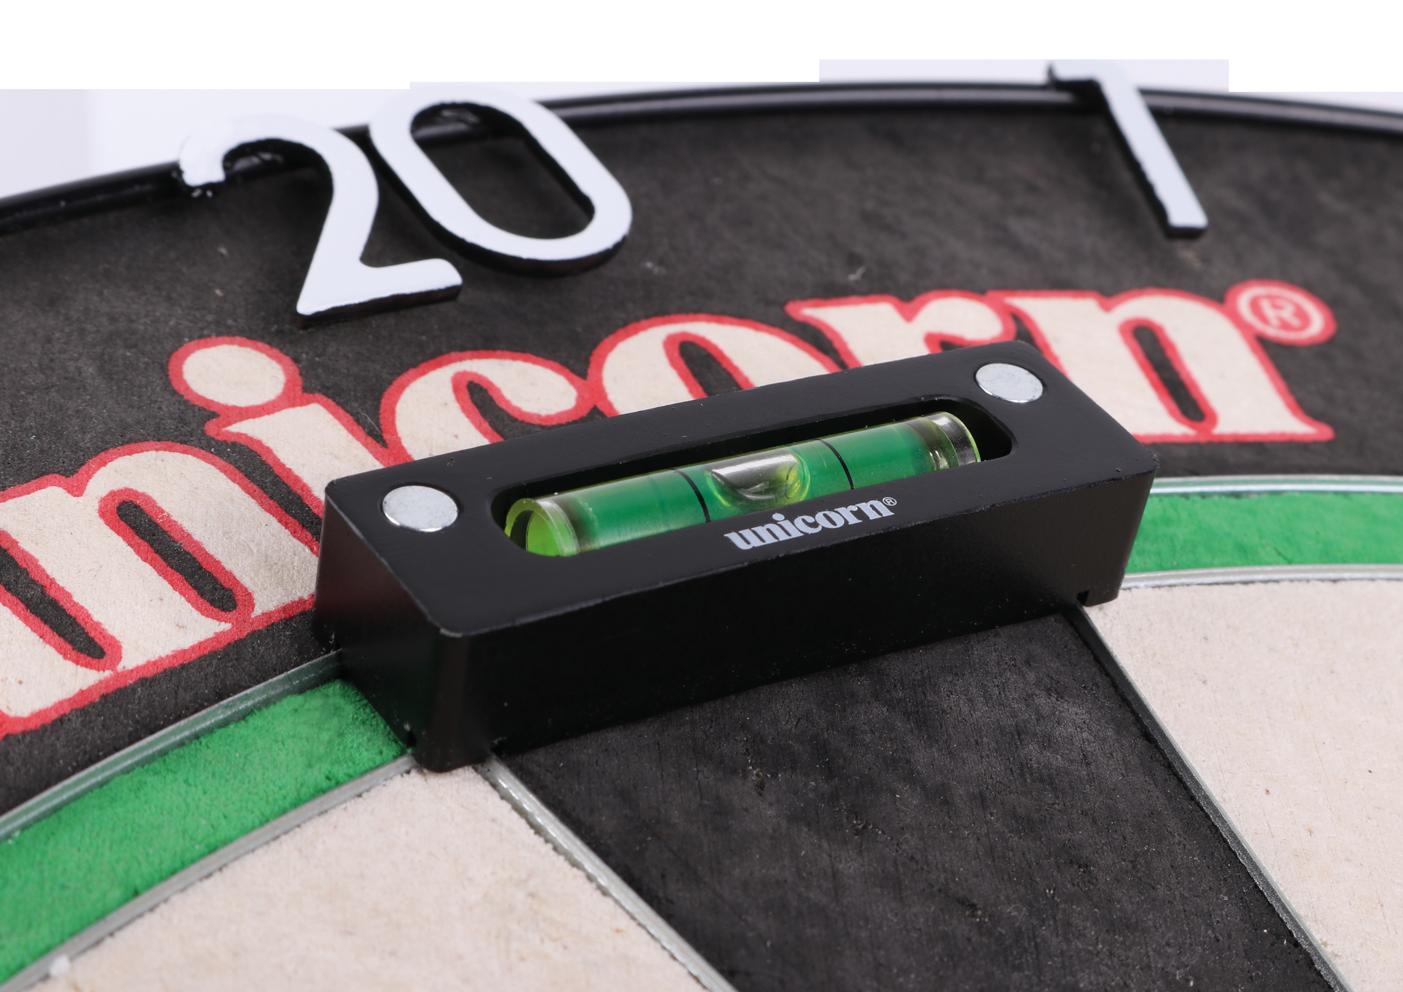 Boardmate Dartboard Leveller